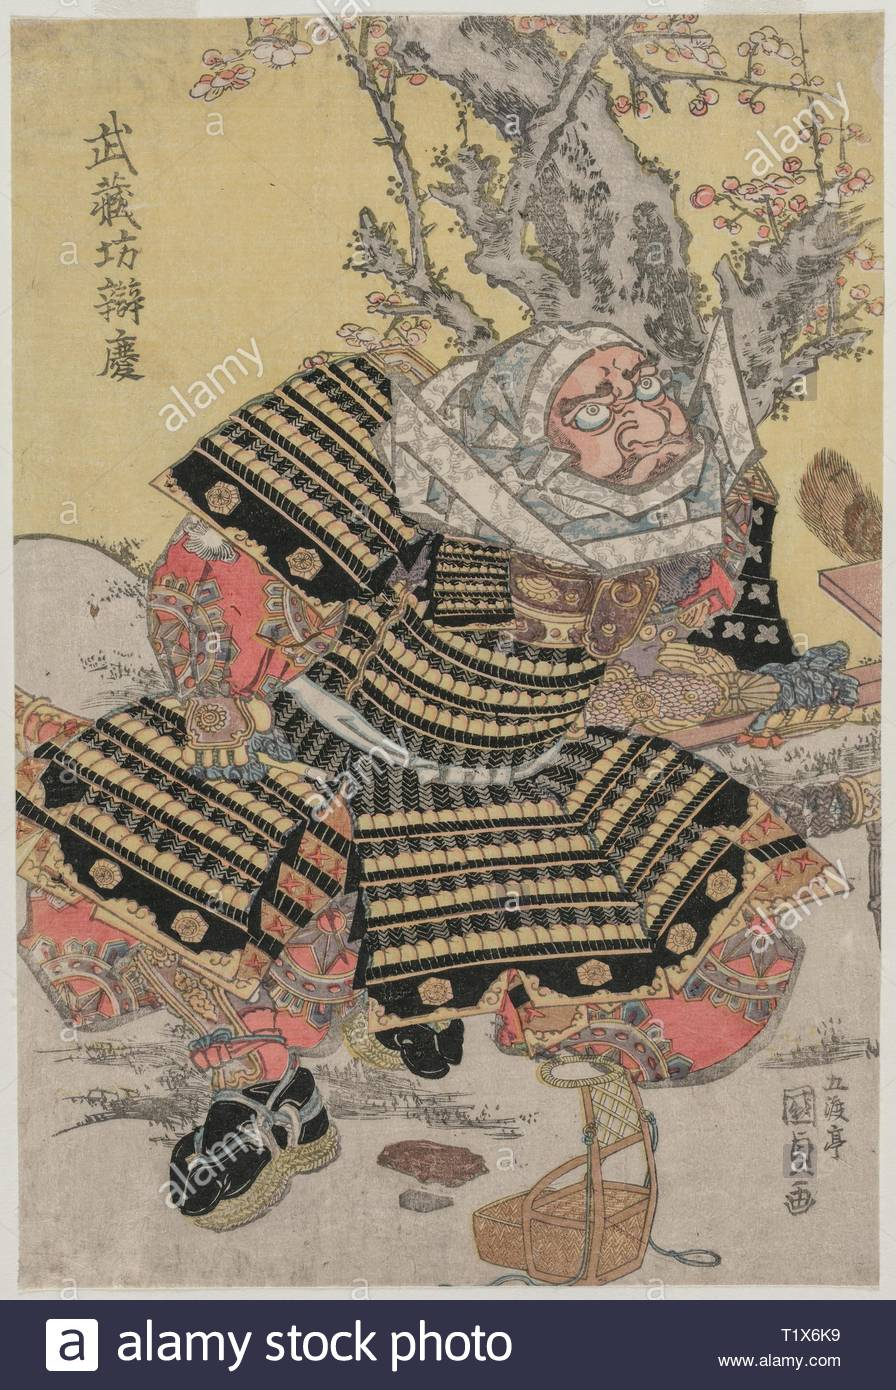 Musashibo Benkei Kneeling by a Plum Tree, c. mid or late 1810s. Gototei Kunisada (Japanese, 1786-1864). Color woodblock print; sheet: 37.5 x 25.4 cm (14 3/4 x 10 in.). - Stock Image